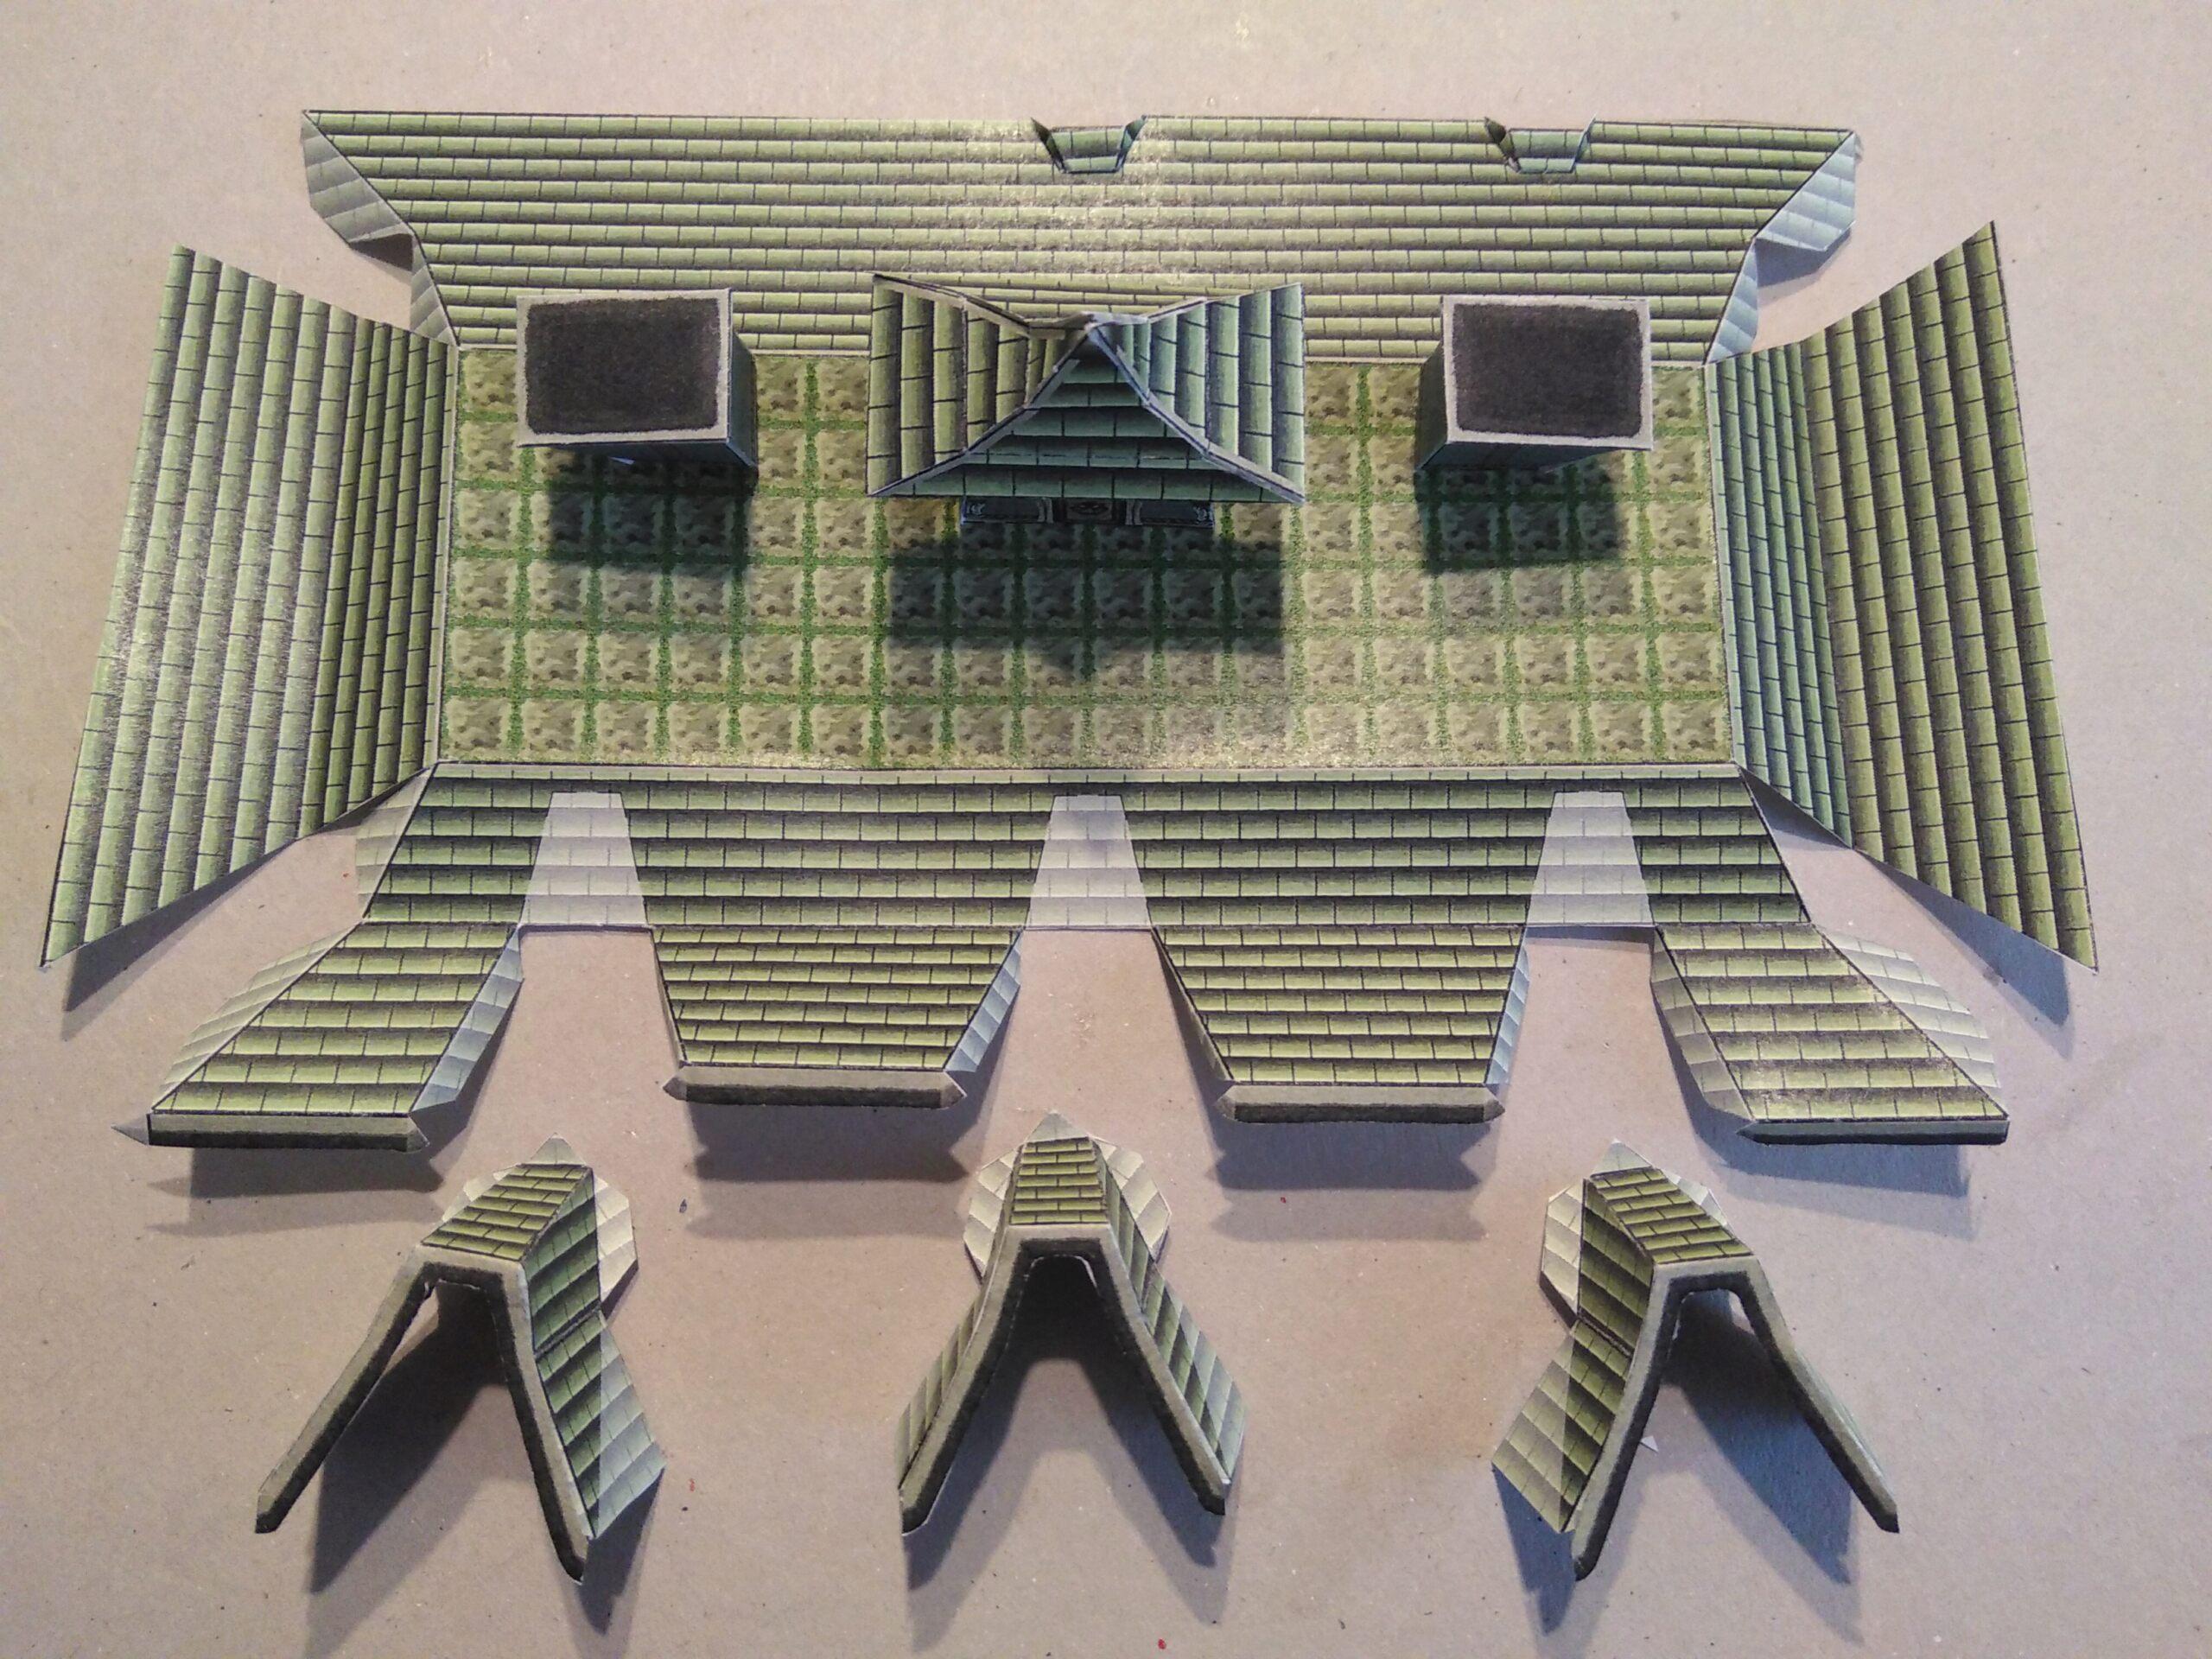 Luigi's Mansion - Die Gruselvilla aus dem Gamecube-Klassiker Img_2025